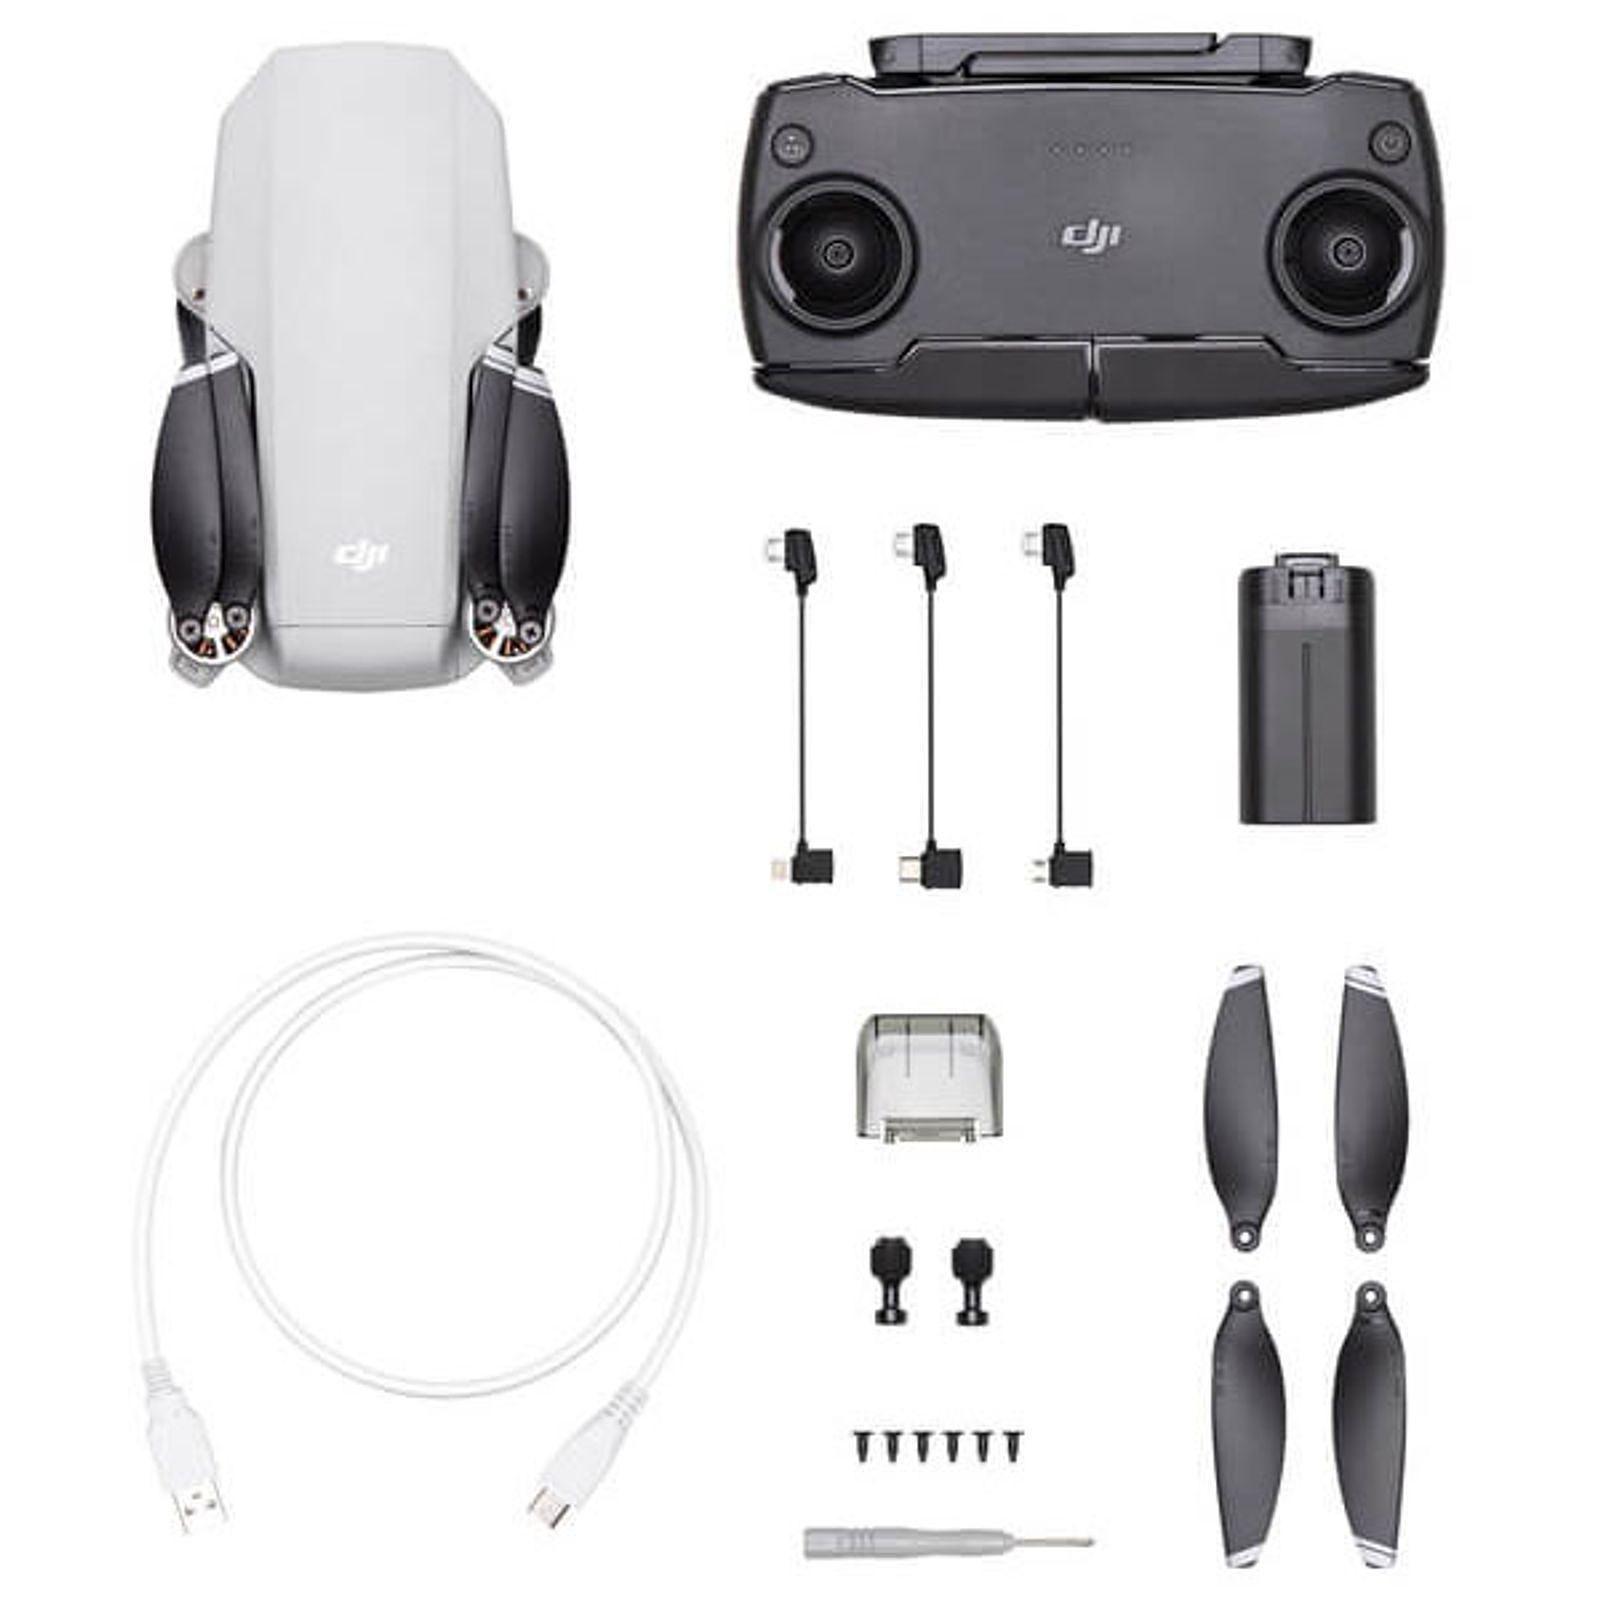 DJI Mavic Mini: Drohne (30min Flugzeit, 2km Reichweite, 2.7K Auflösung)